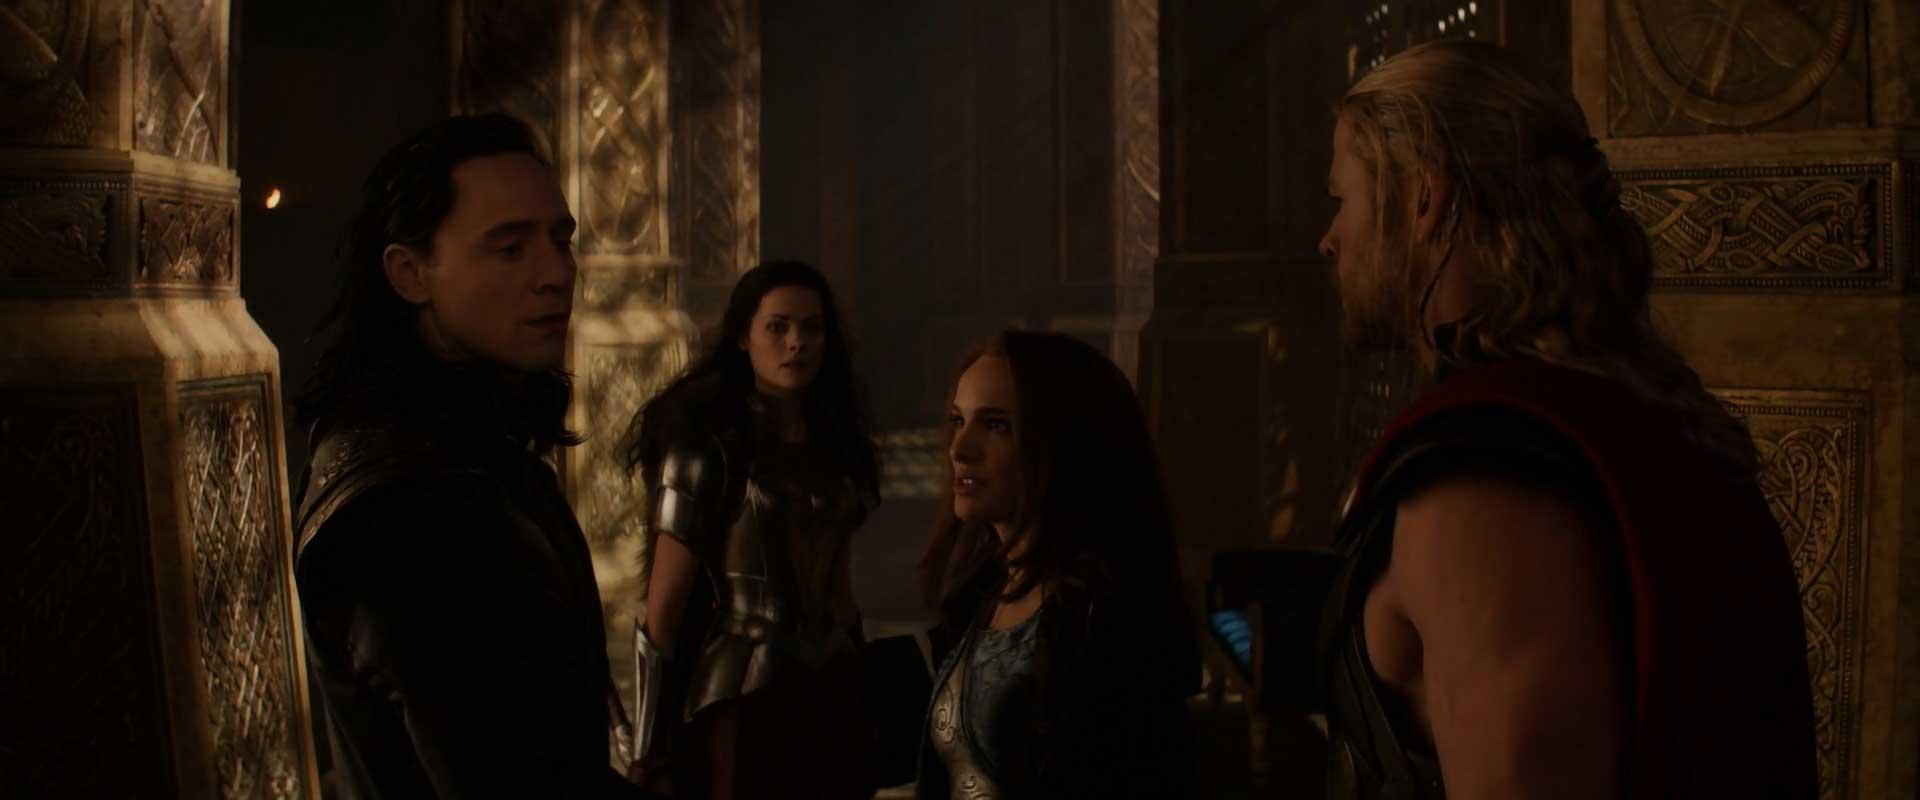 The Road To Avengers Endgame Thor The Dark World - Loki Lady Sif Jane Foster Thor